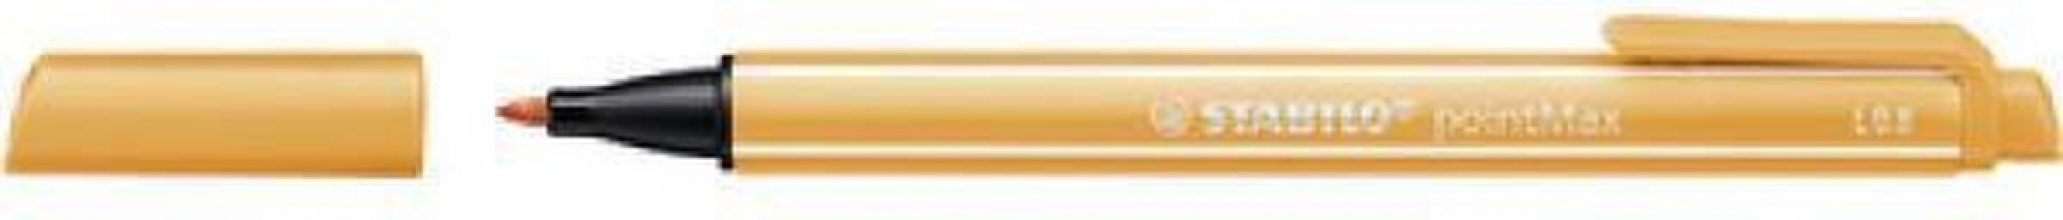 488 , 54 , Stabilo pointmax viltstift oranje